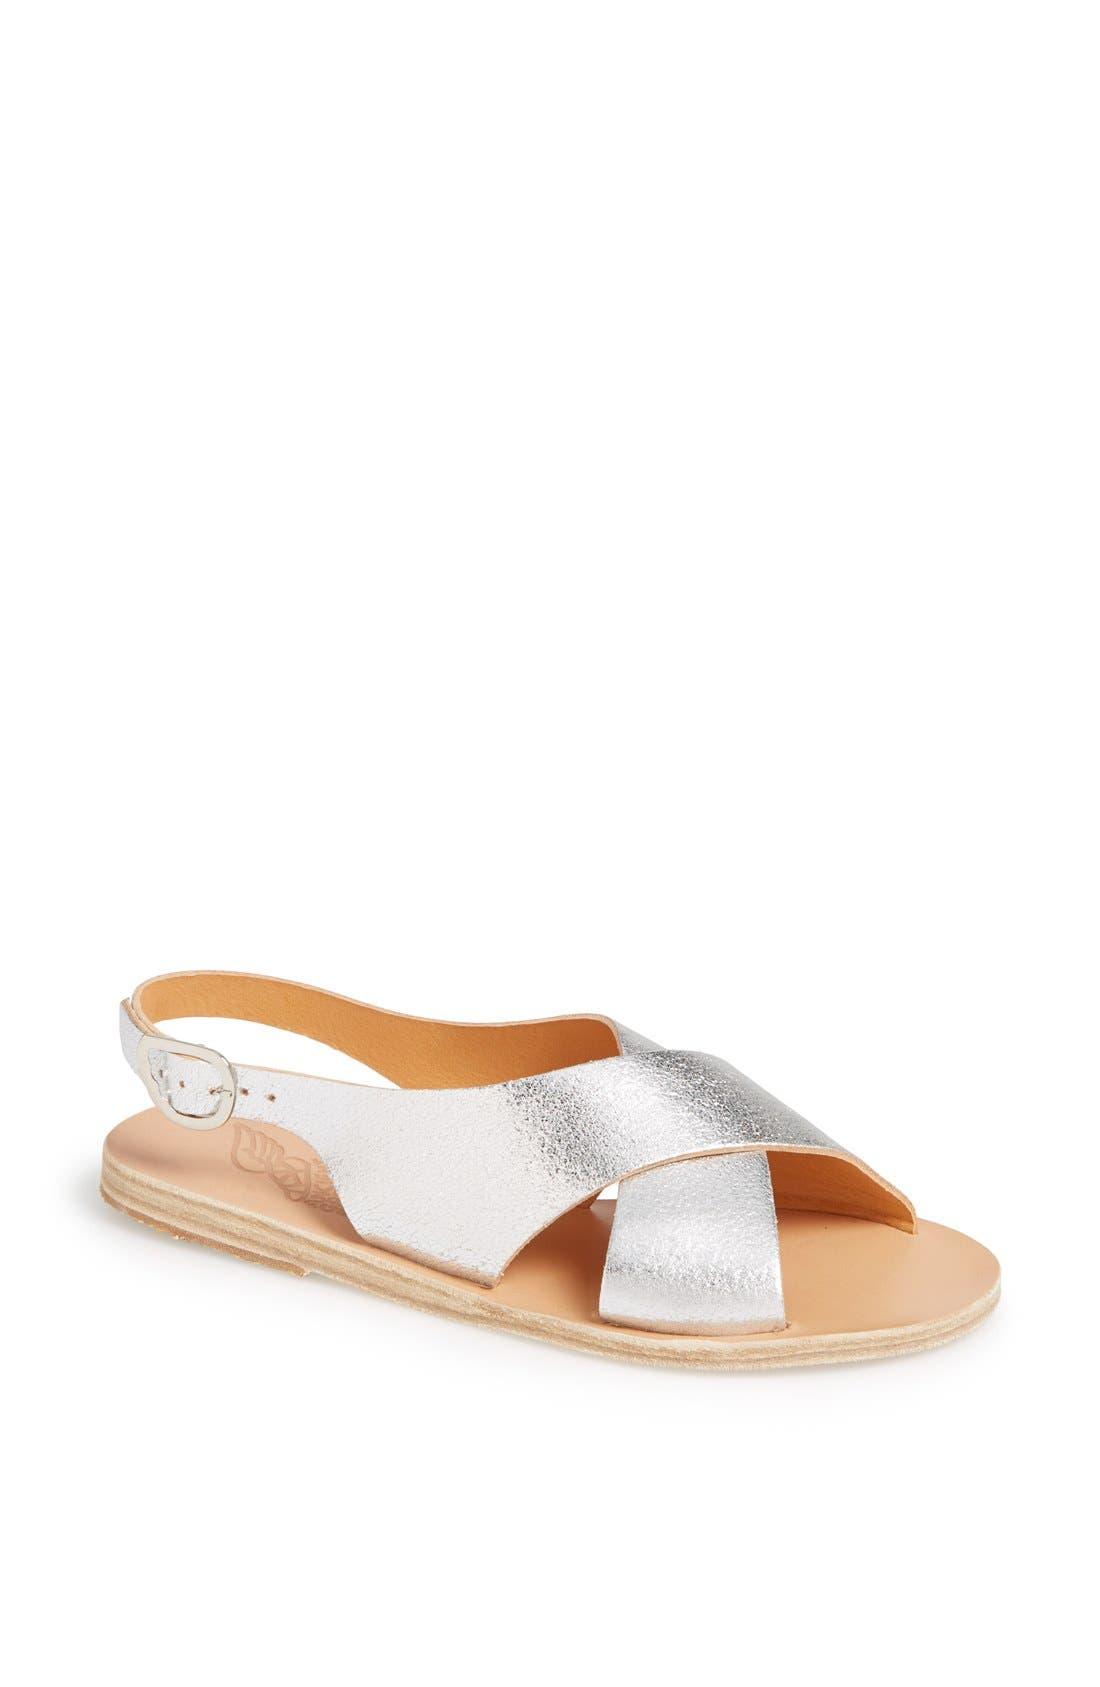 Alternate Image 1 Selected - Ancient Greek Sandals 'Maria' Leather Slingback Sandal